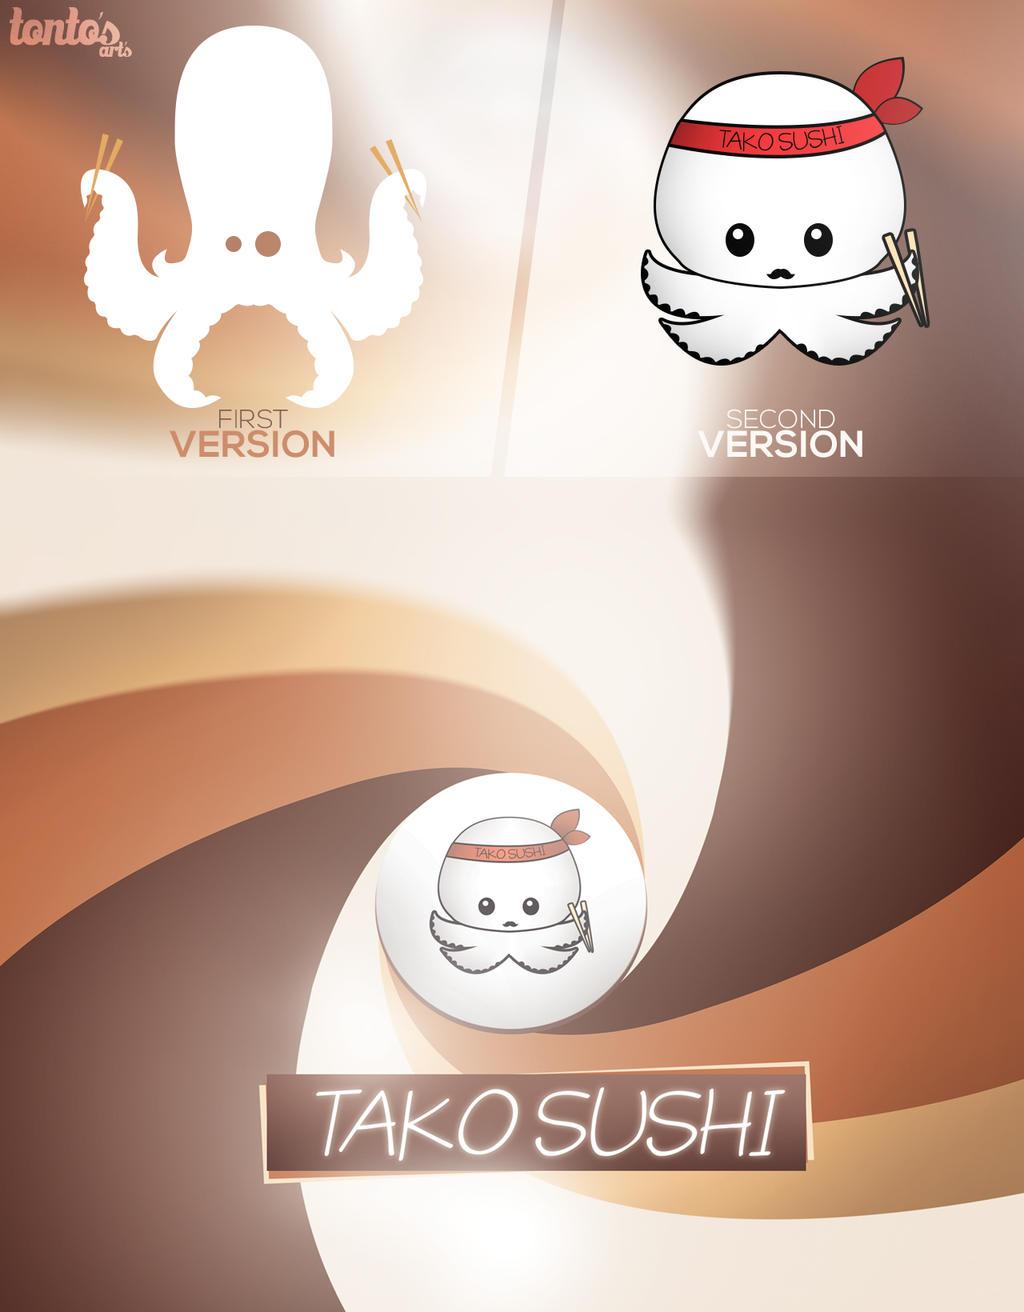 Sushi Restaurants Logo's (MENU Cover)